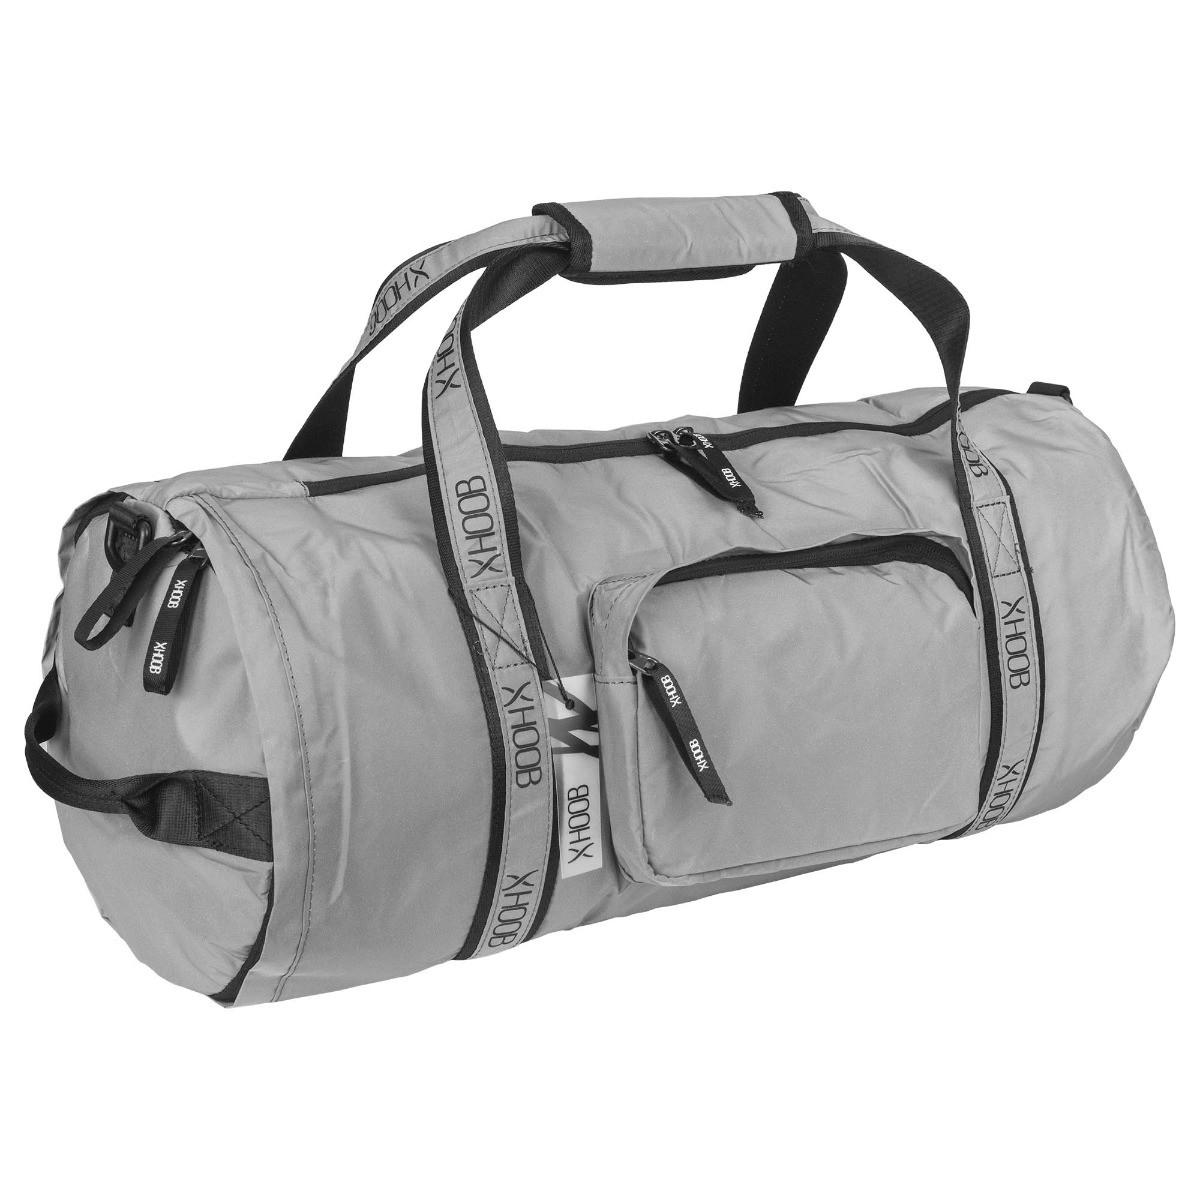 Hoob Cyber Mini Bag | Светоотражающая сумка для кальяна